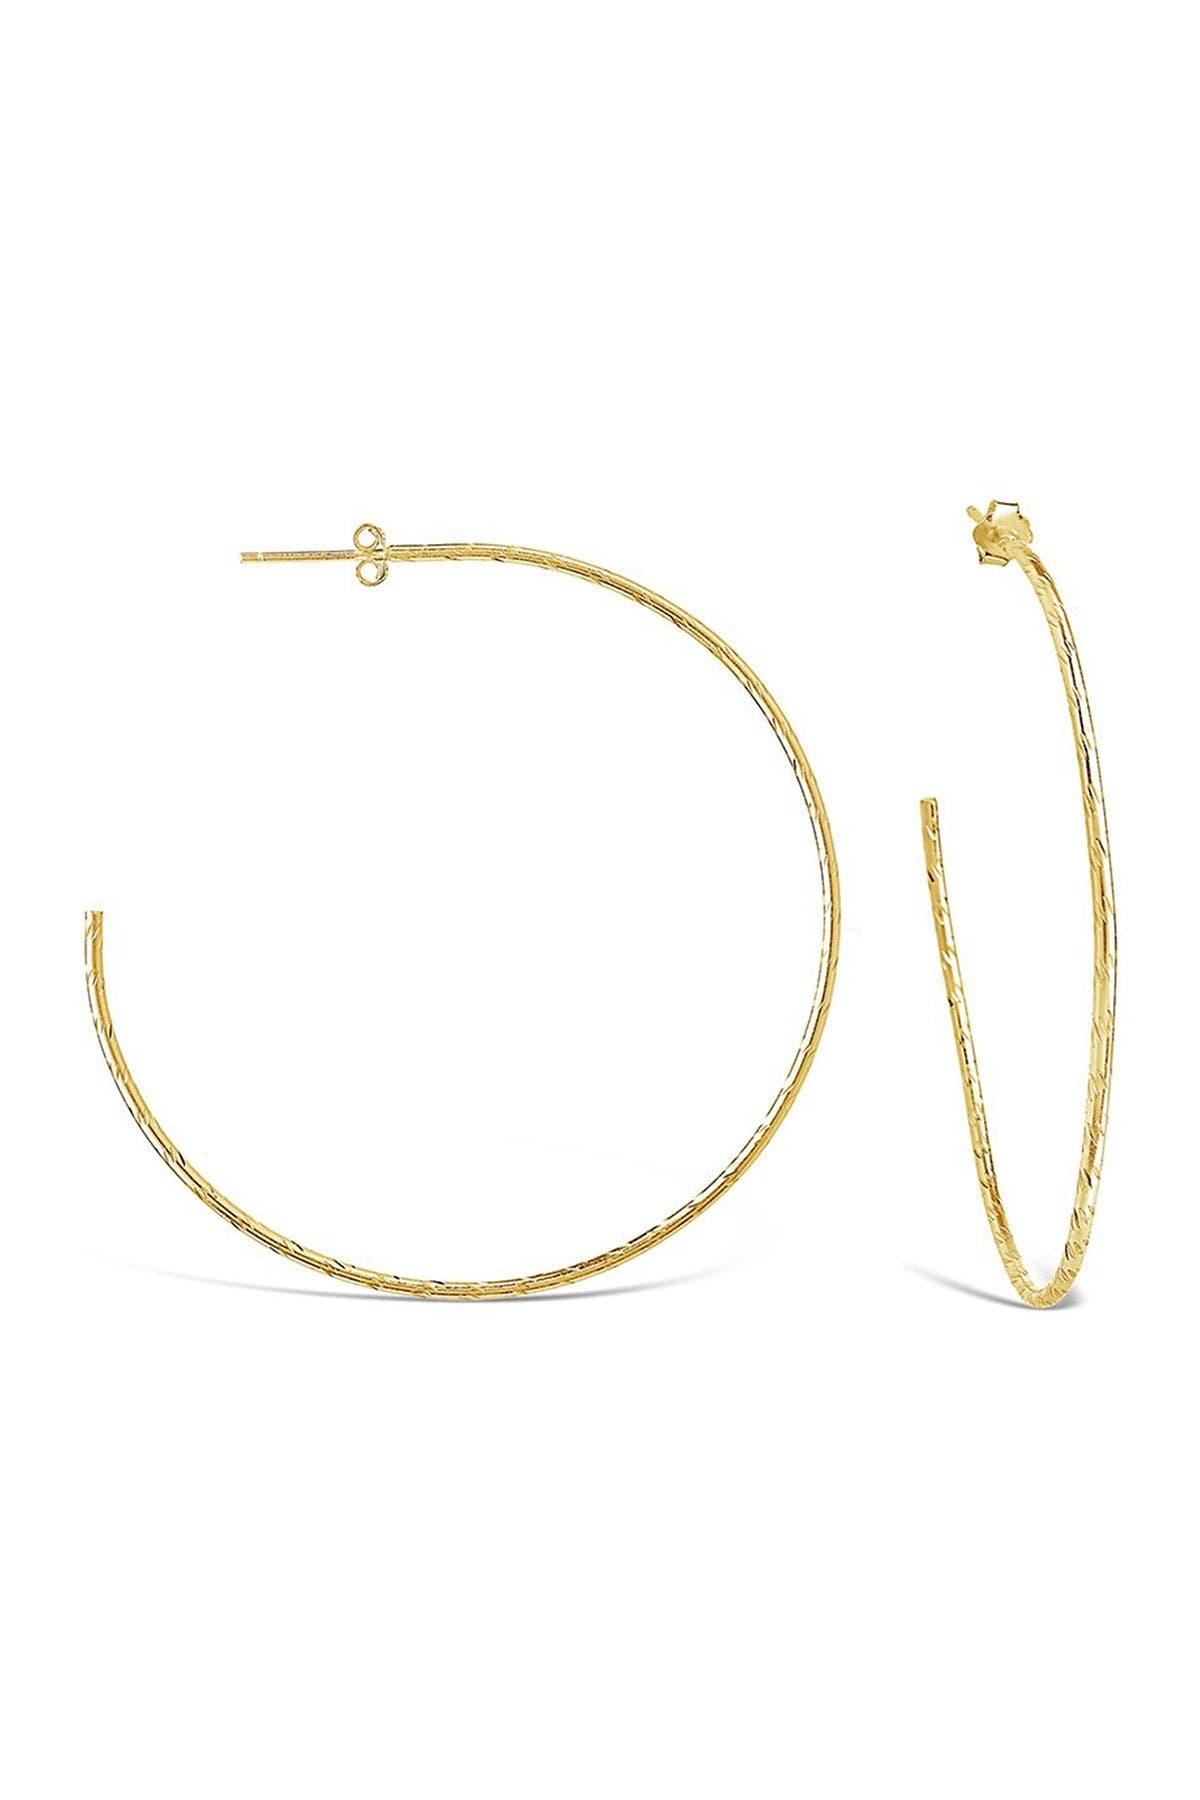 "Sterling Forever 14K Yellow Gold Vermeil Hammered 2.25"" Hoop Earrings"